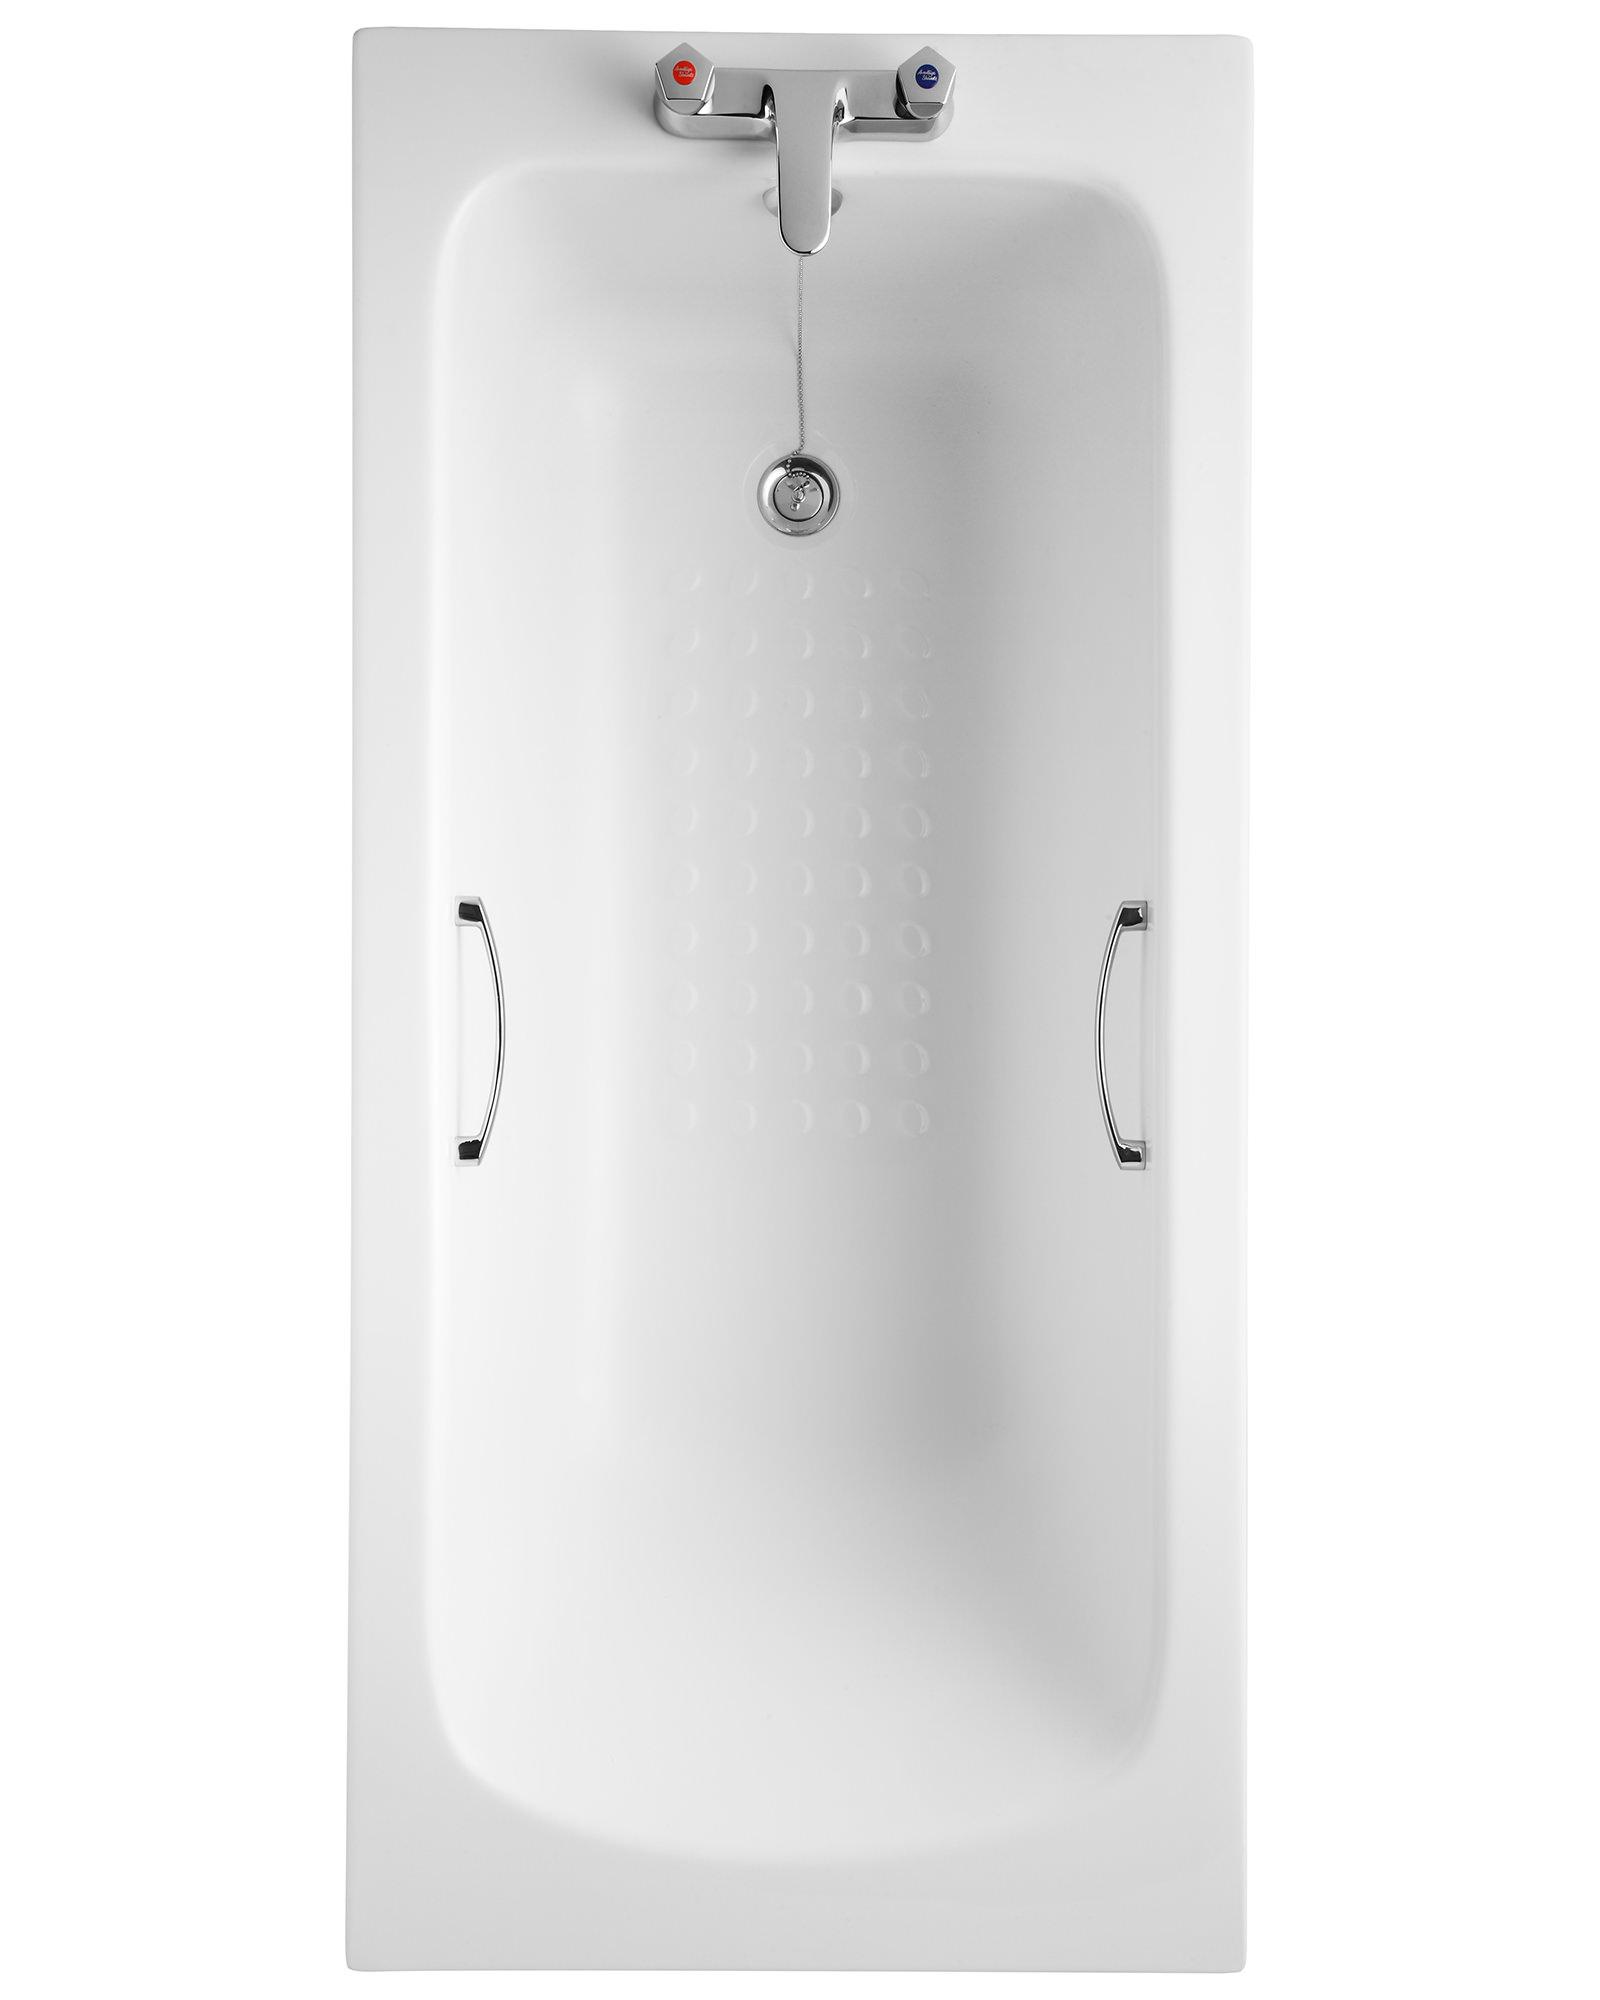 Armitage Shanks Sandringham 21 1500 x 700mm 2TH Bath With Grips ...